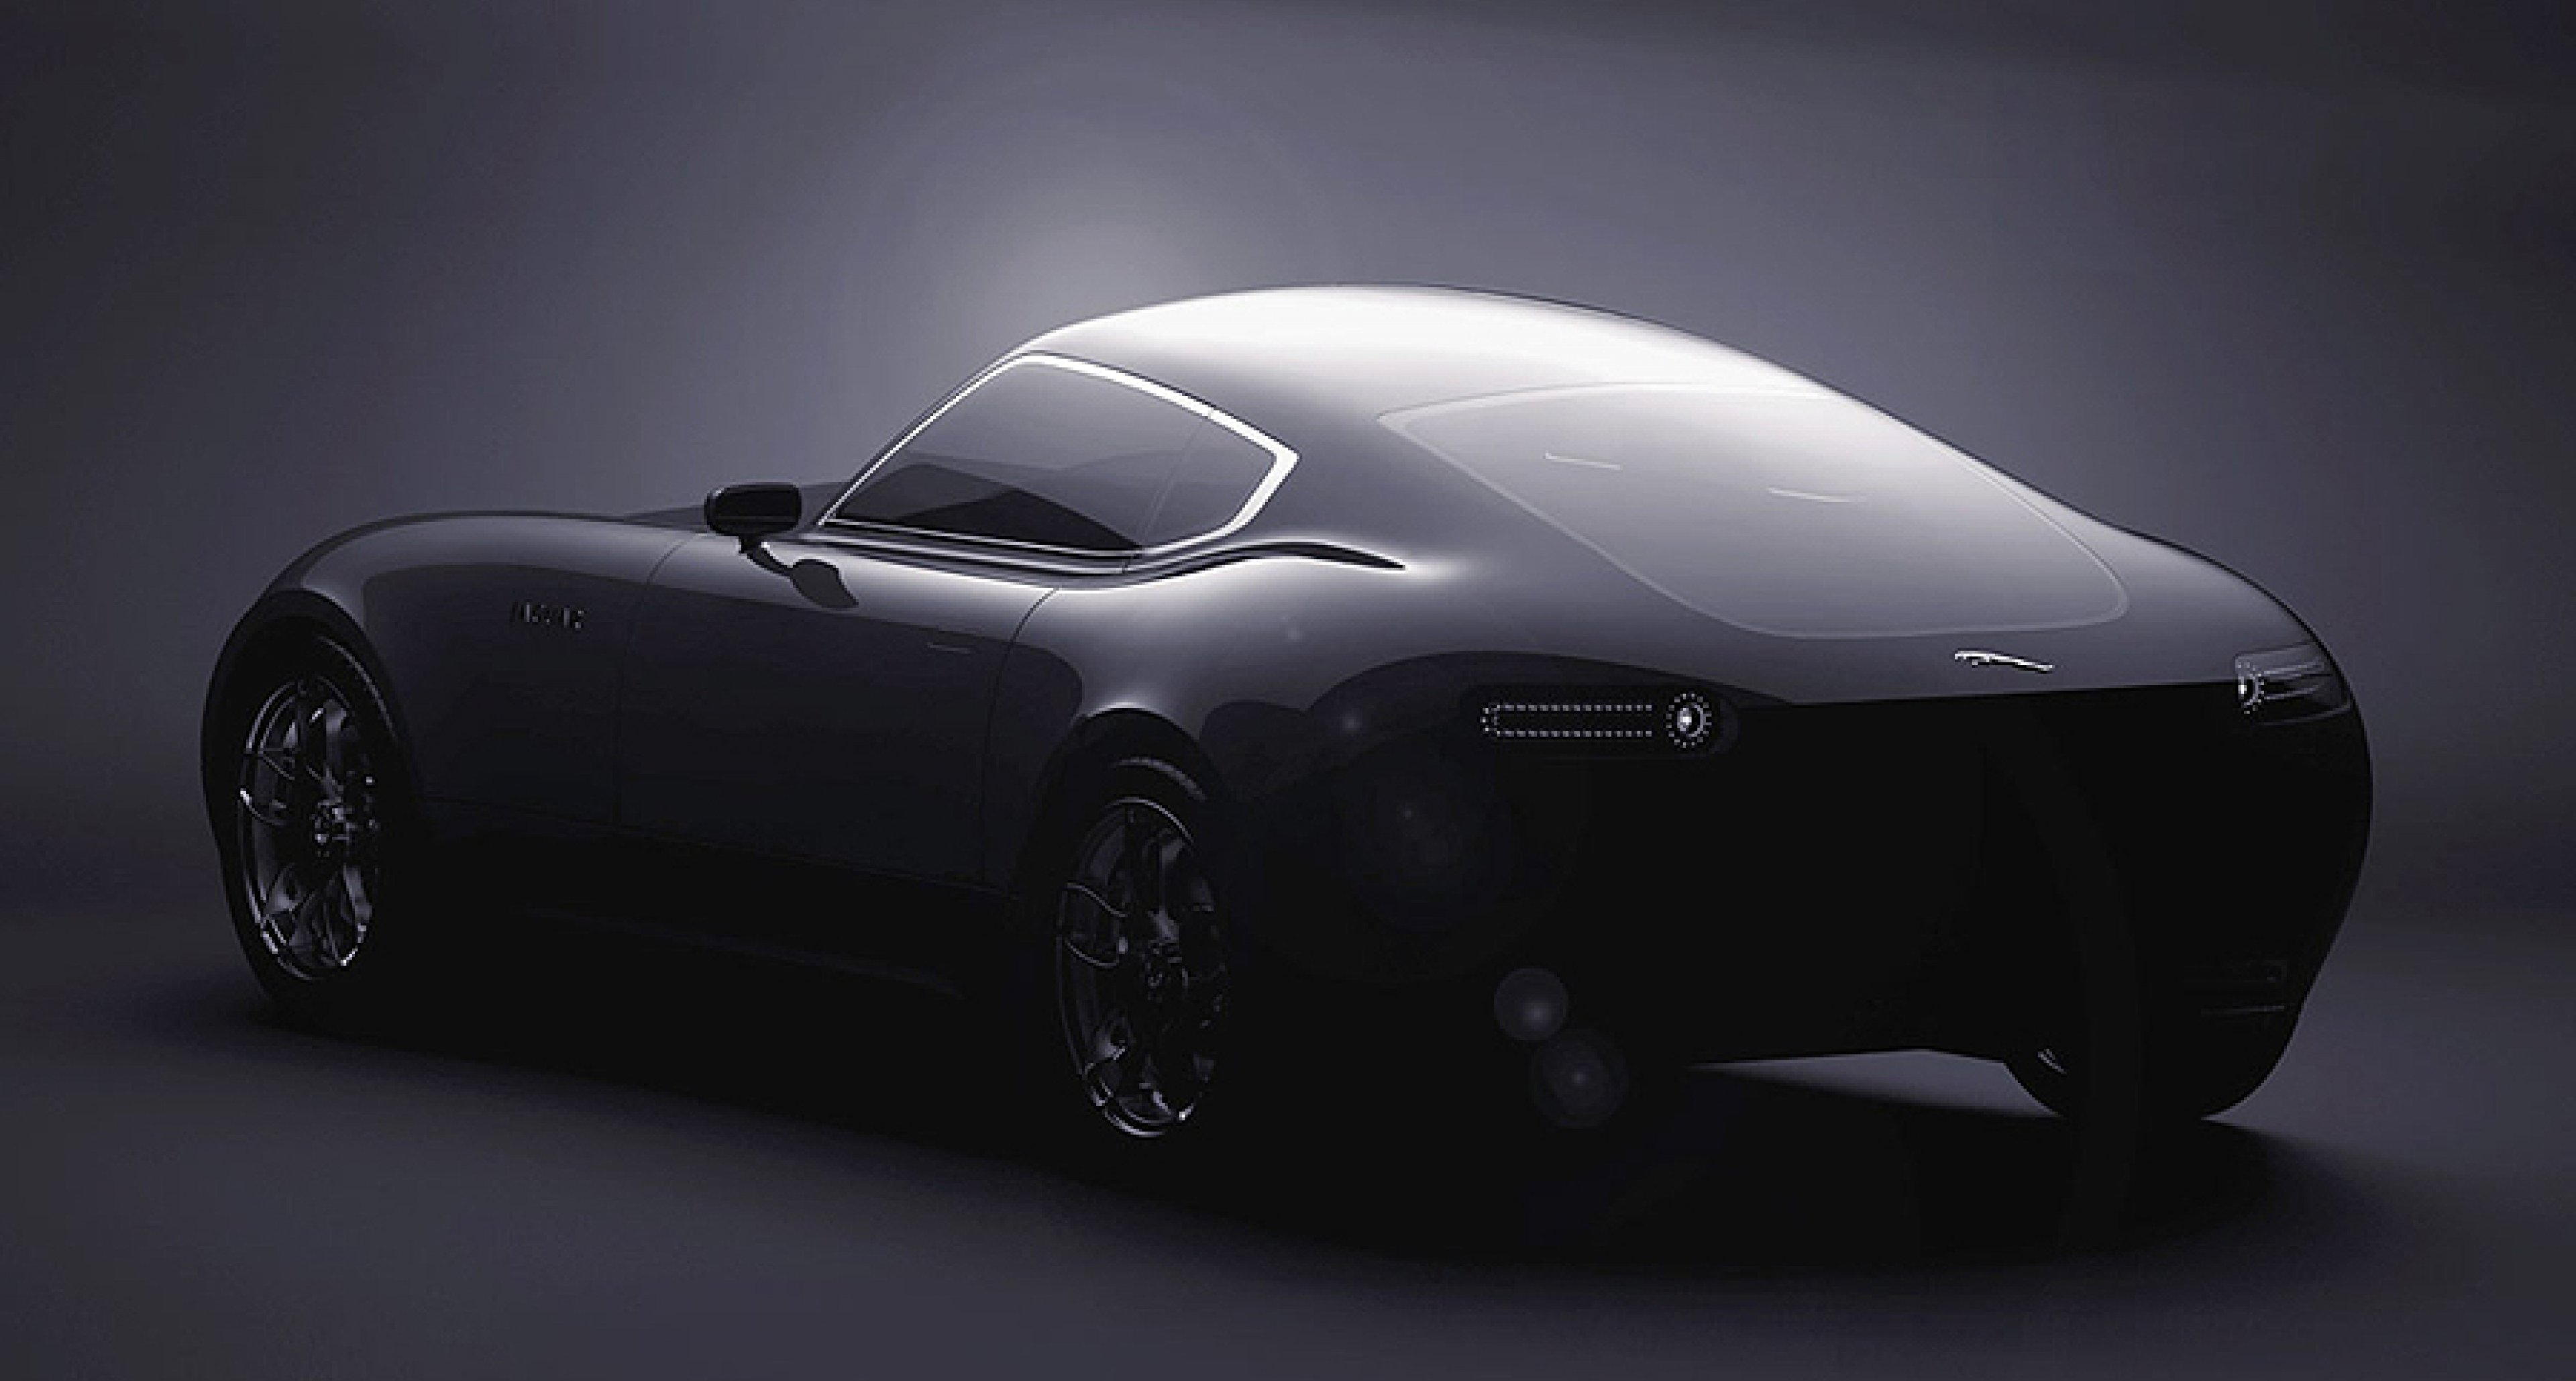 E-Type Concept by Laszlo Varga: Made in Budapest